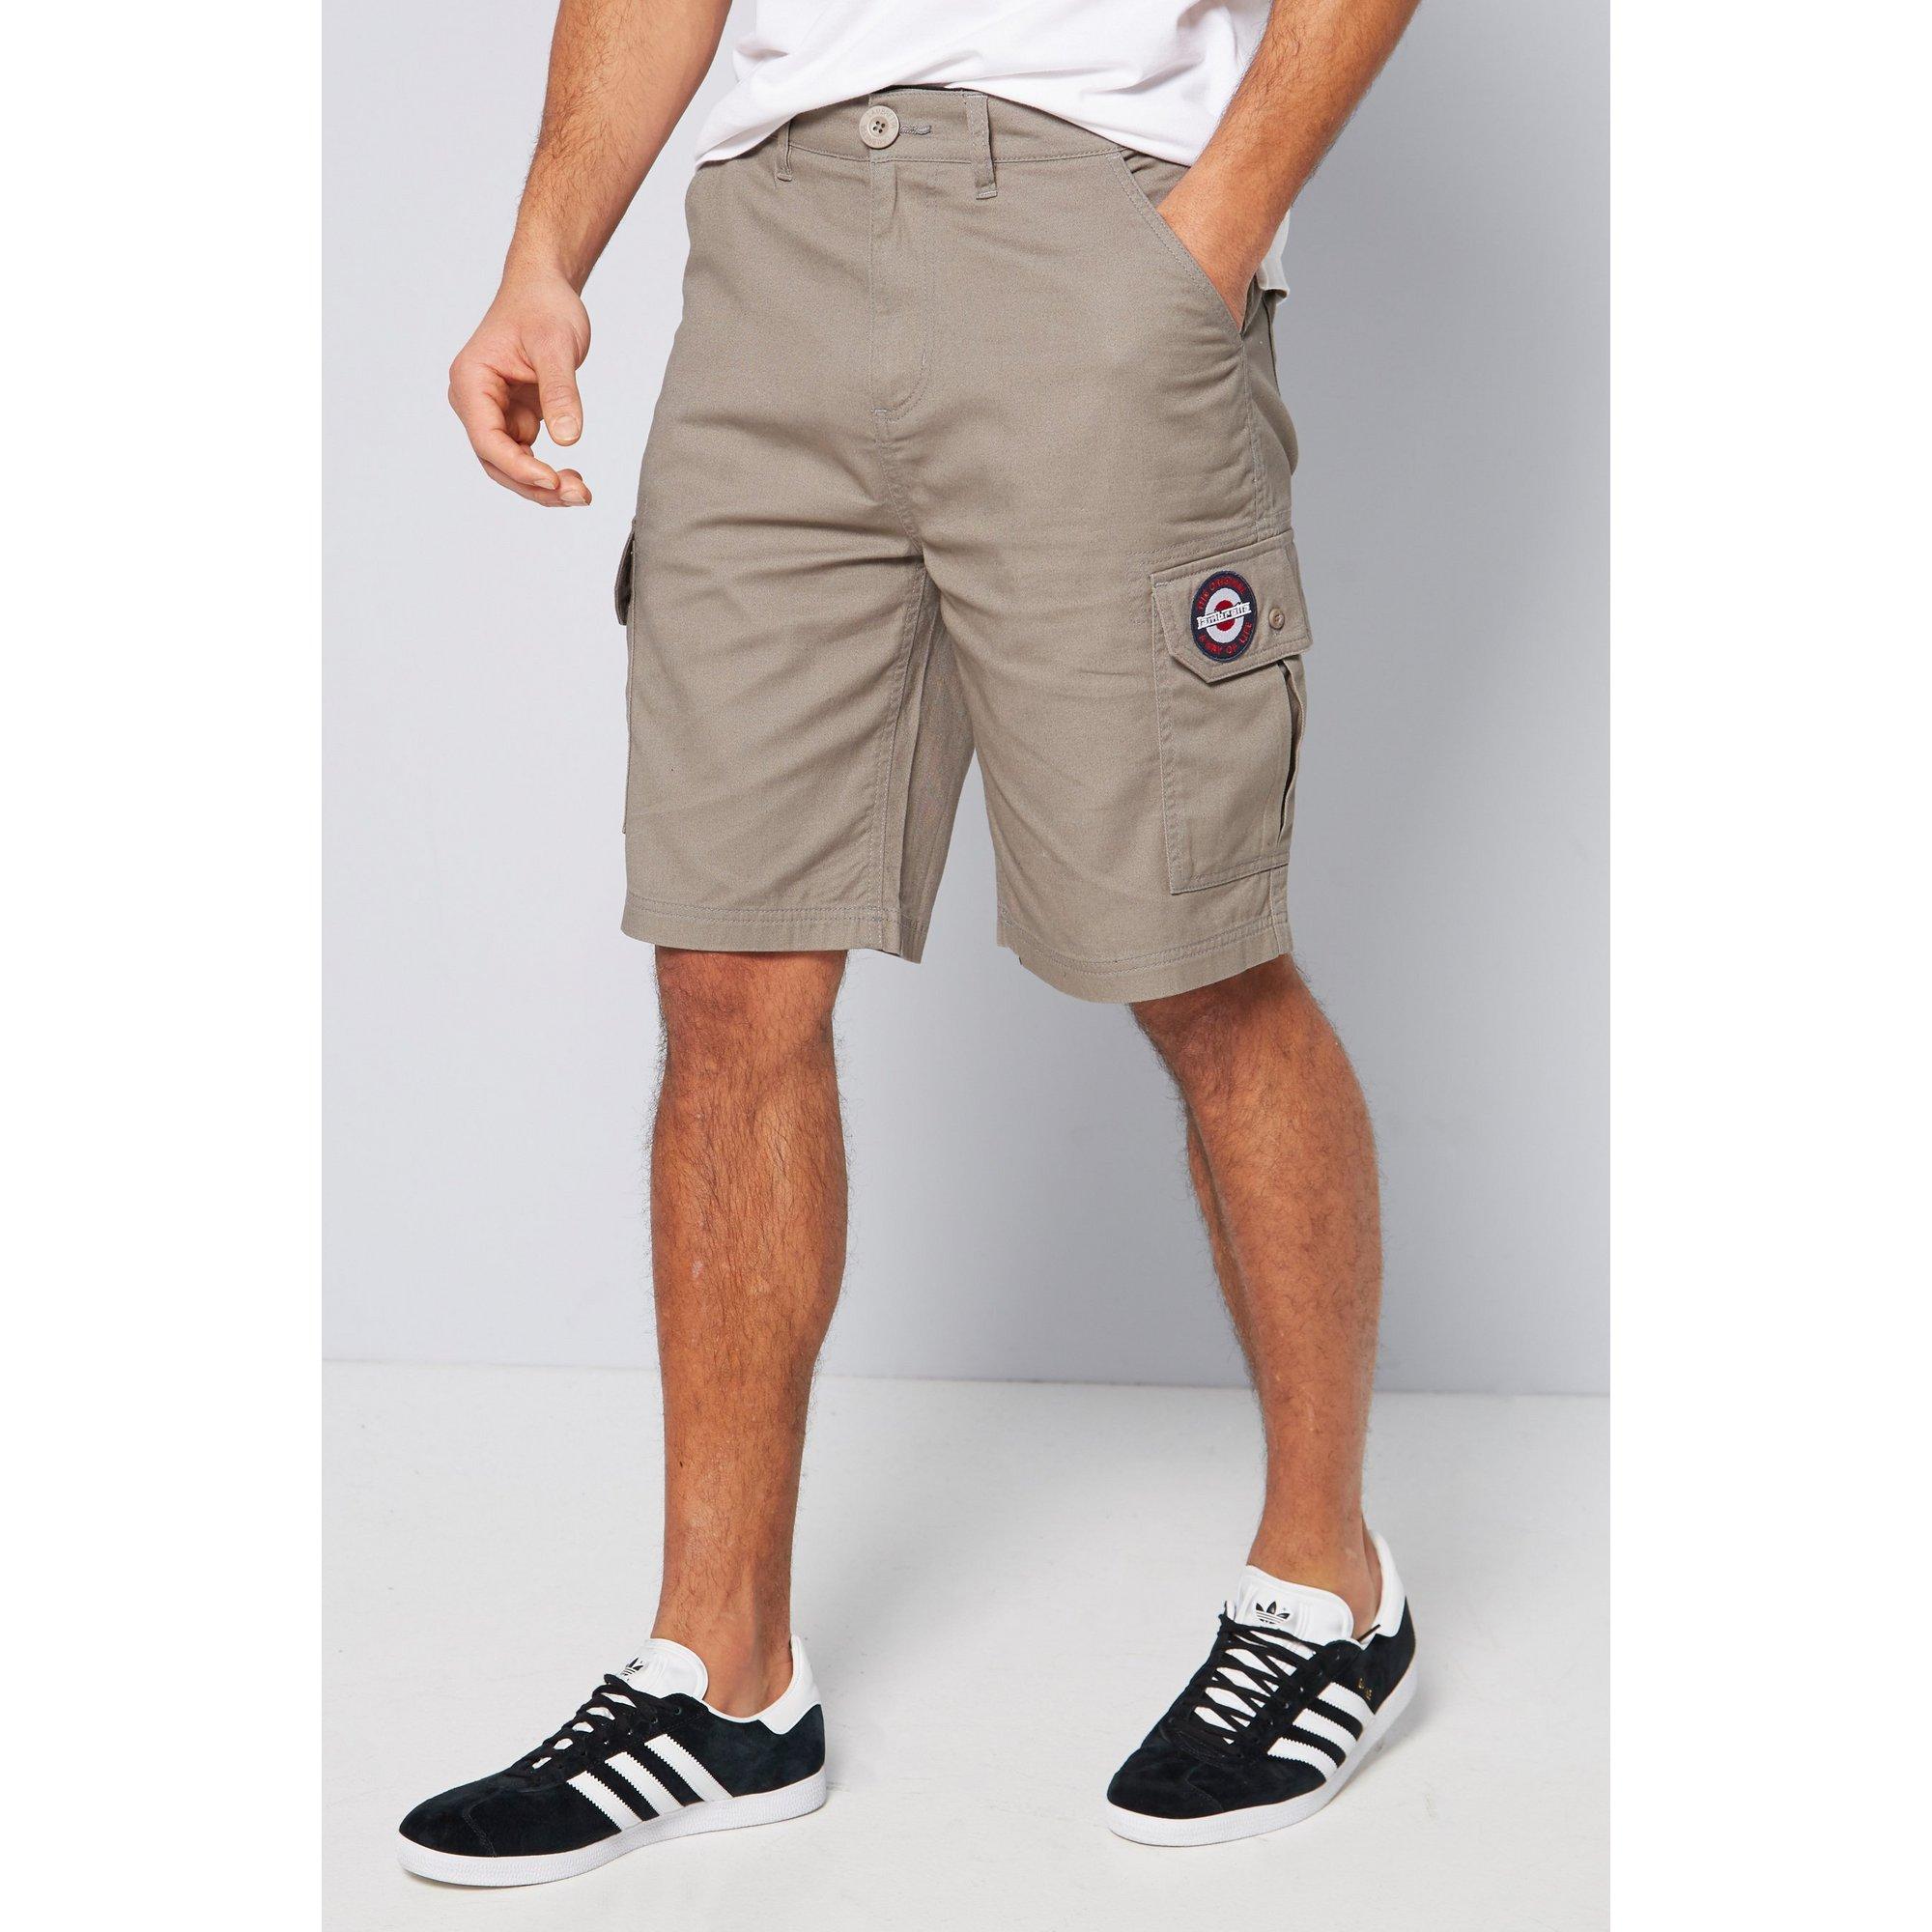 Image of Lambretta Grey Cargo Shorts